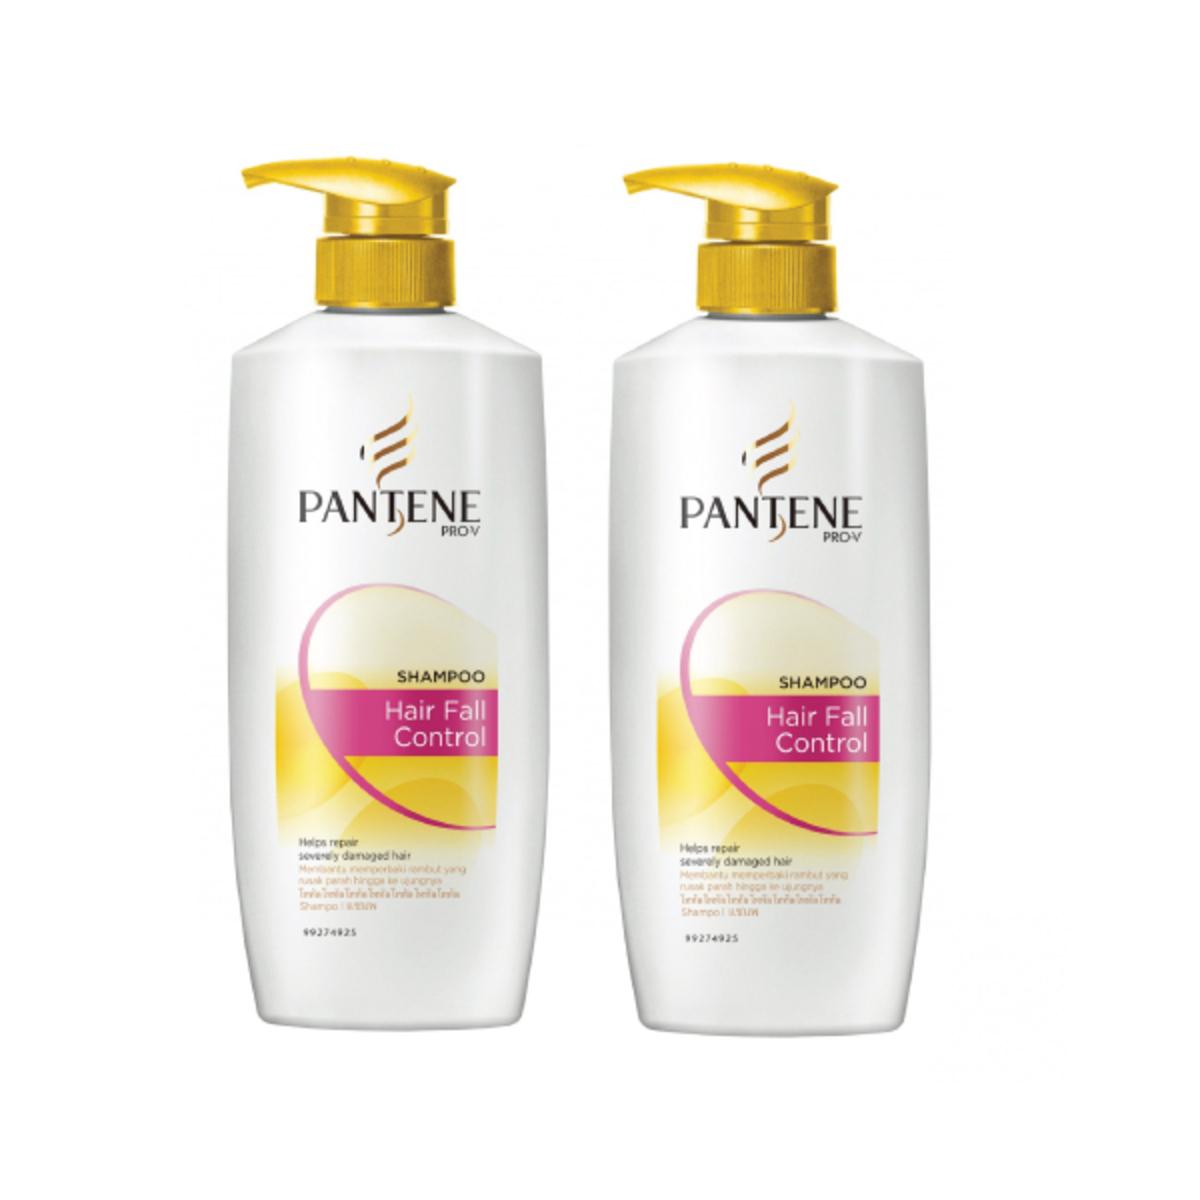 Pantene Shampoo Total Damage Care 670ml X2 Go Shop Sampo Hairfall Control 750ml Rm4434